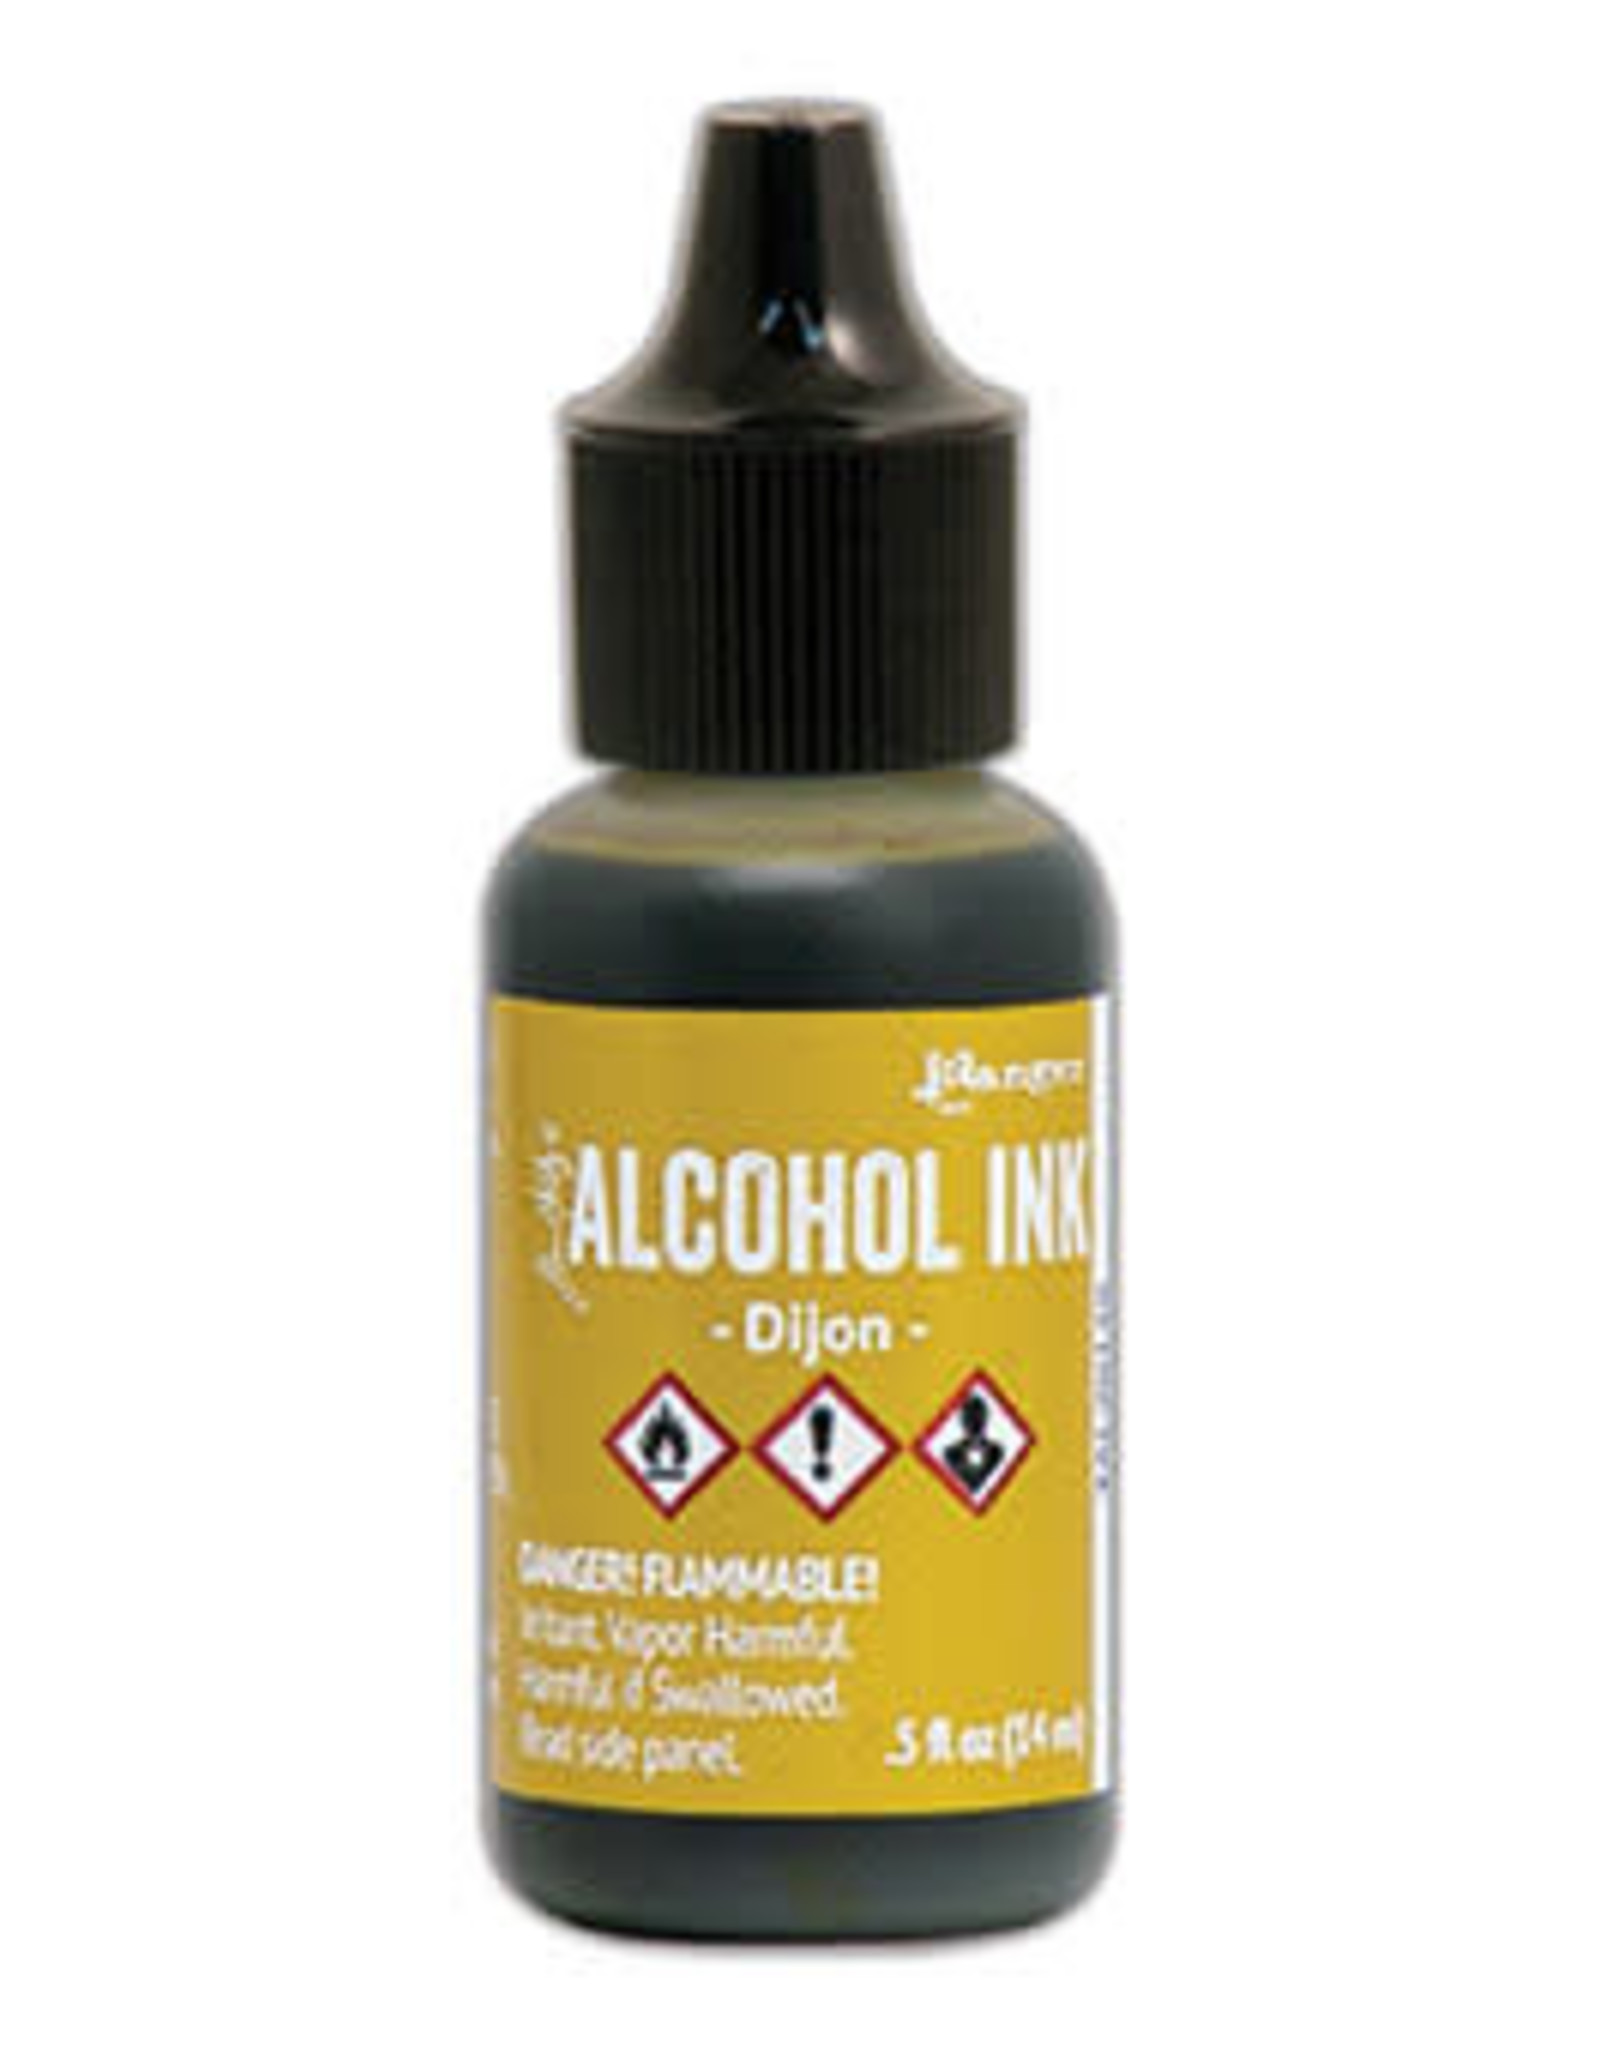 Tim Holtz Alcohol Ink 1/2 oz Dijon